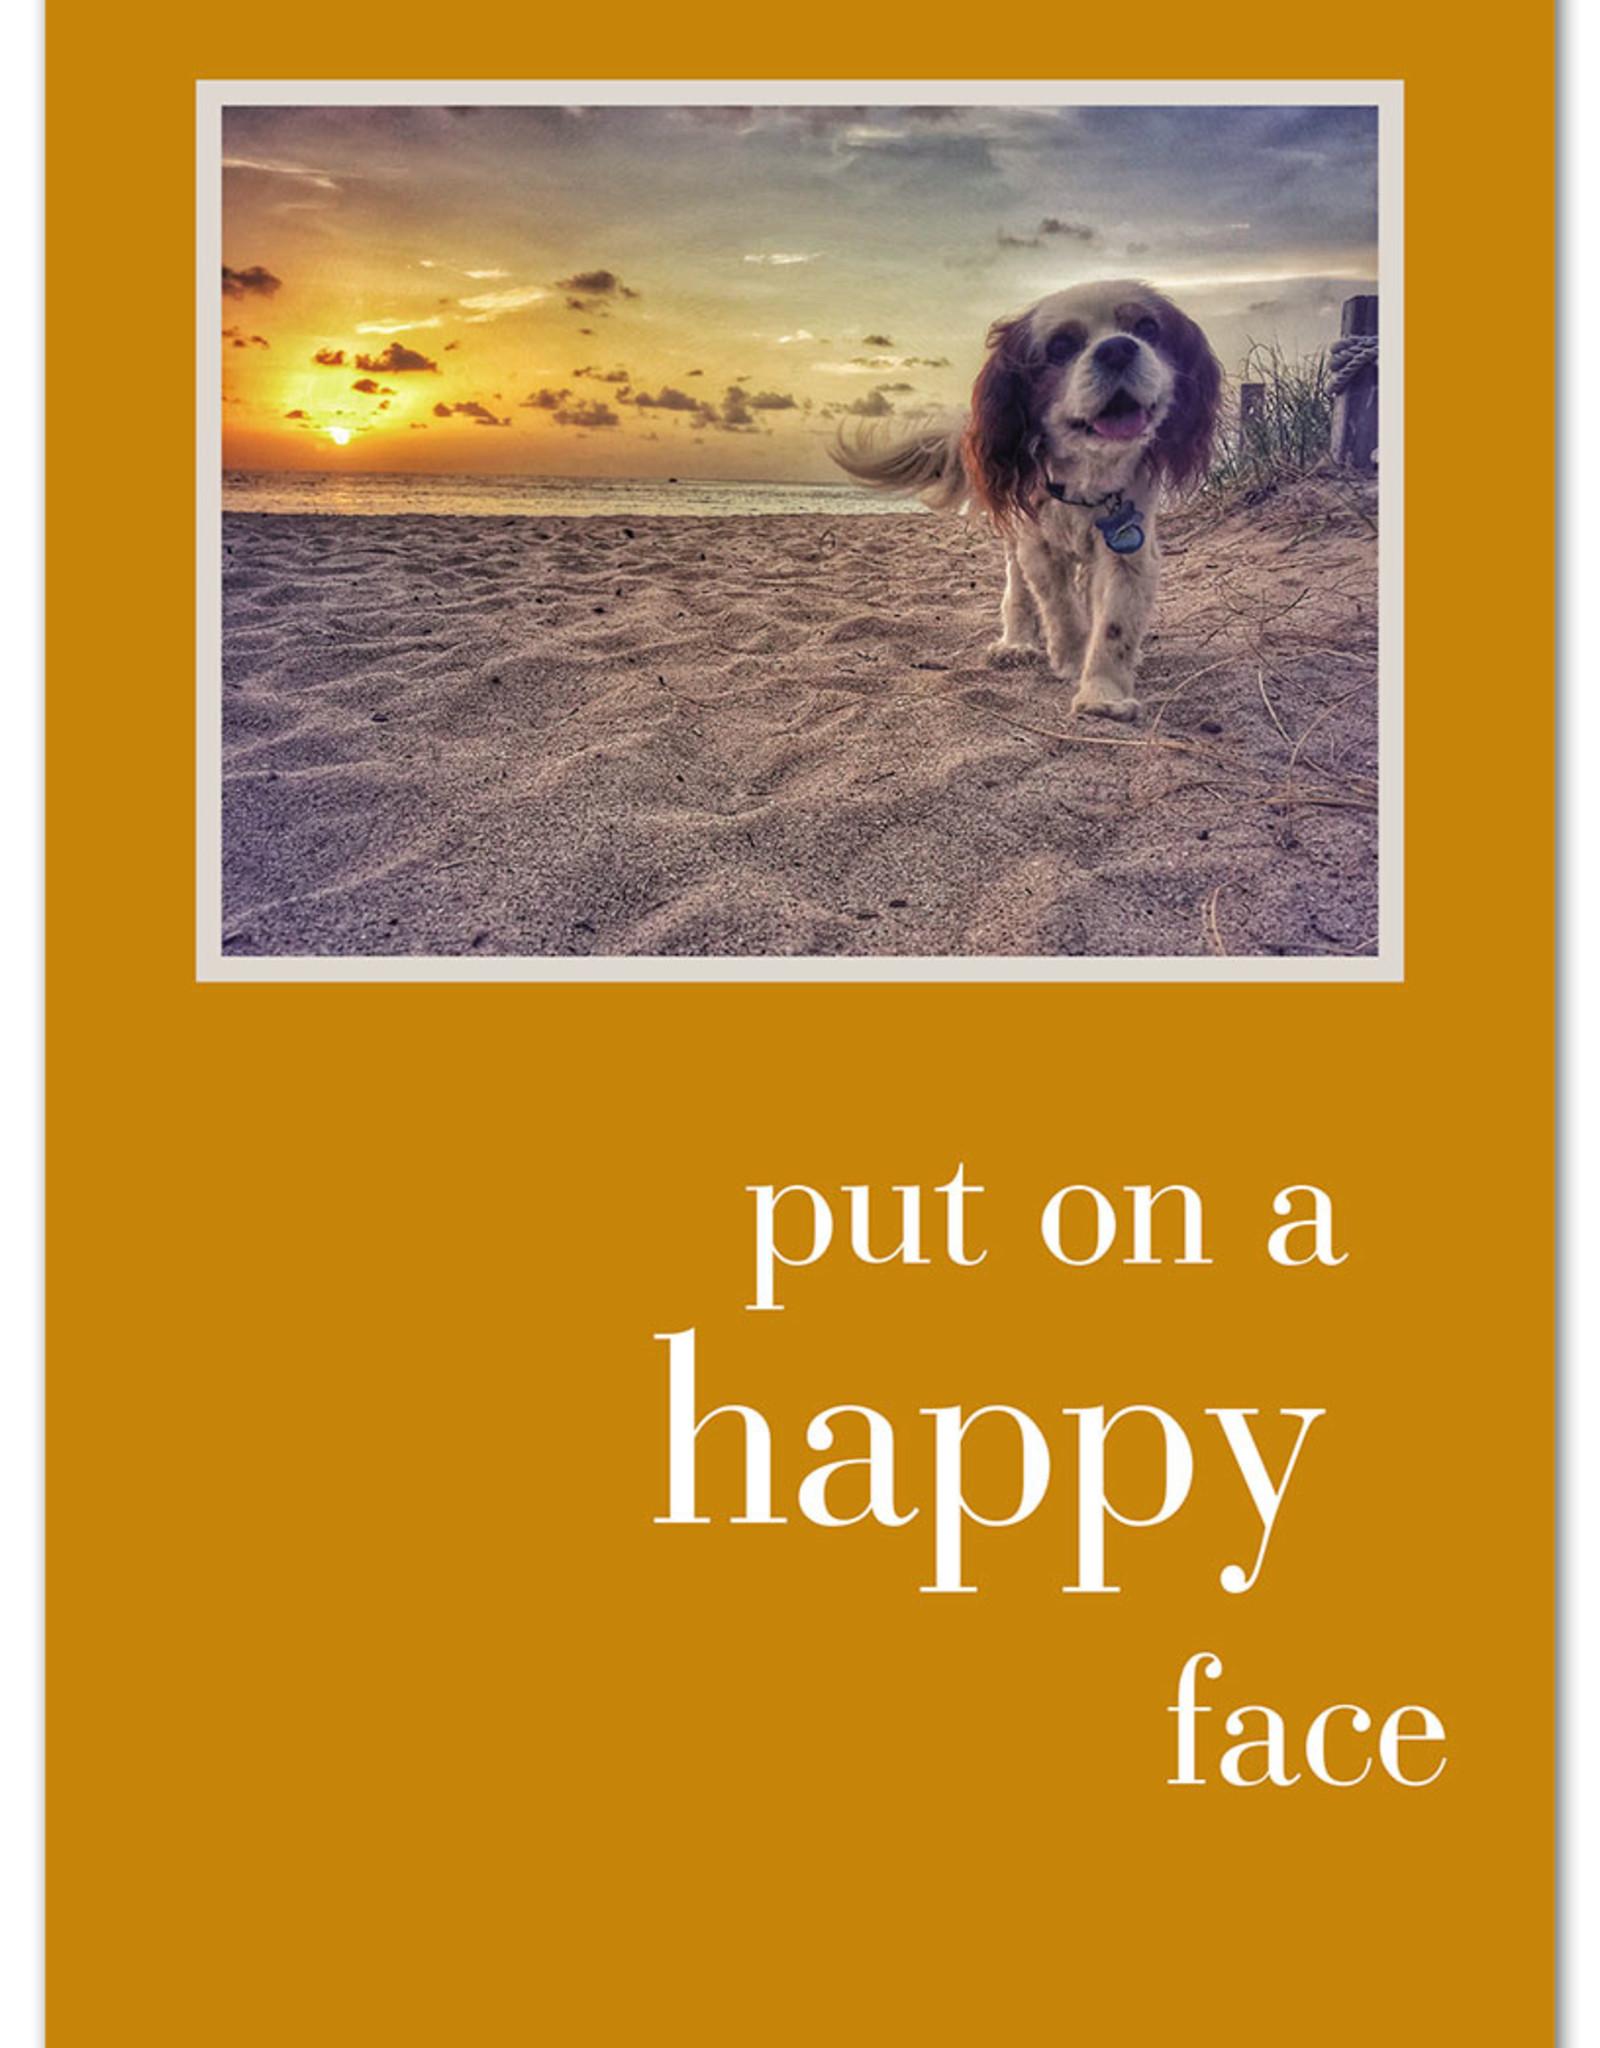 Cardthartic Cardthartic - Put on a happy face birthday card